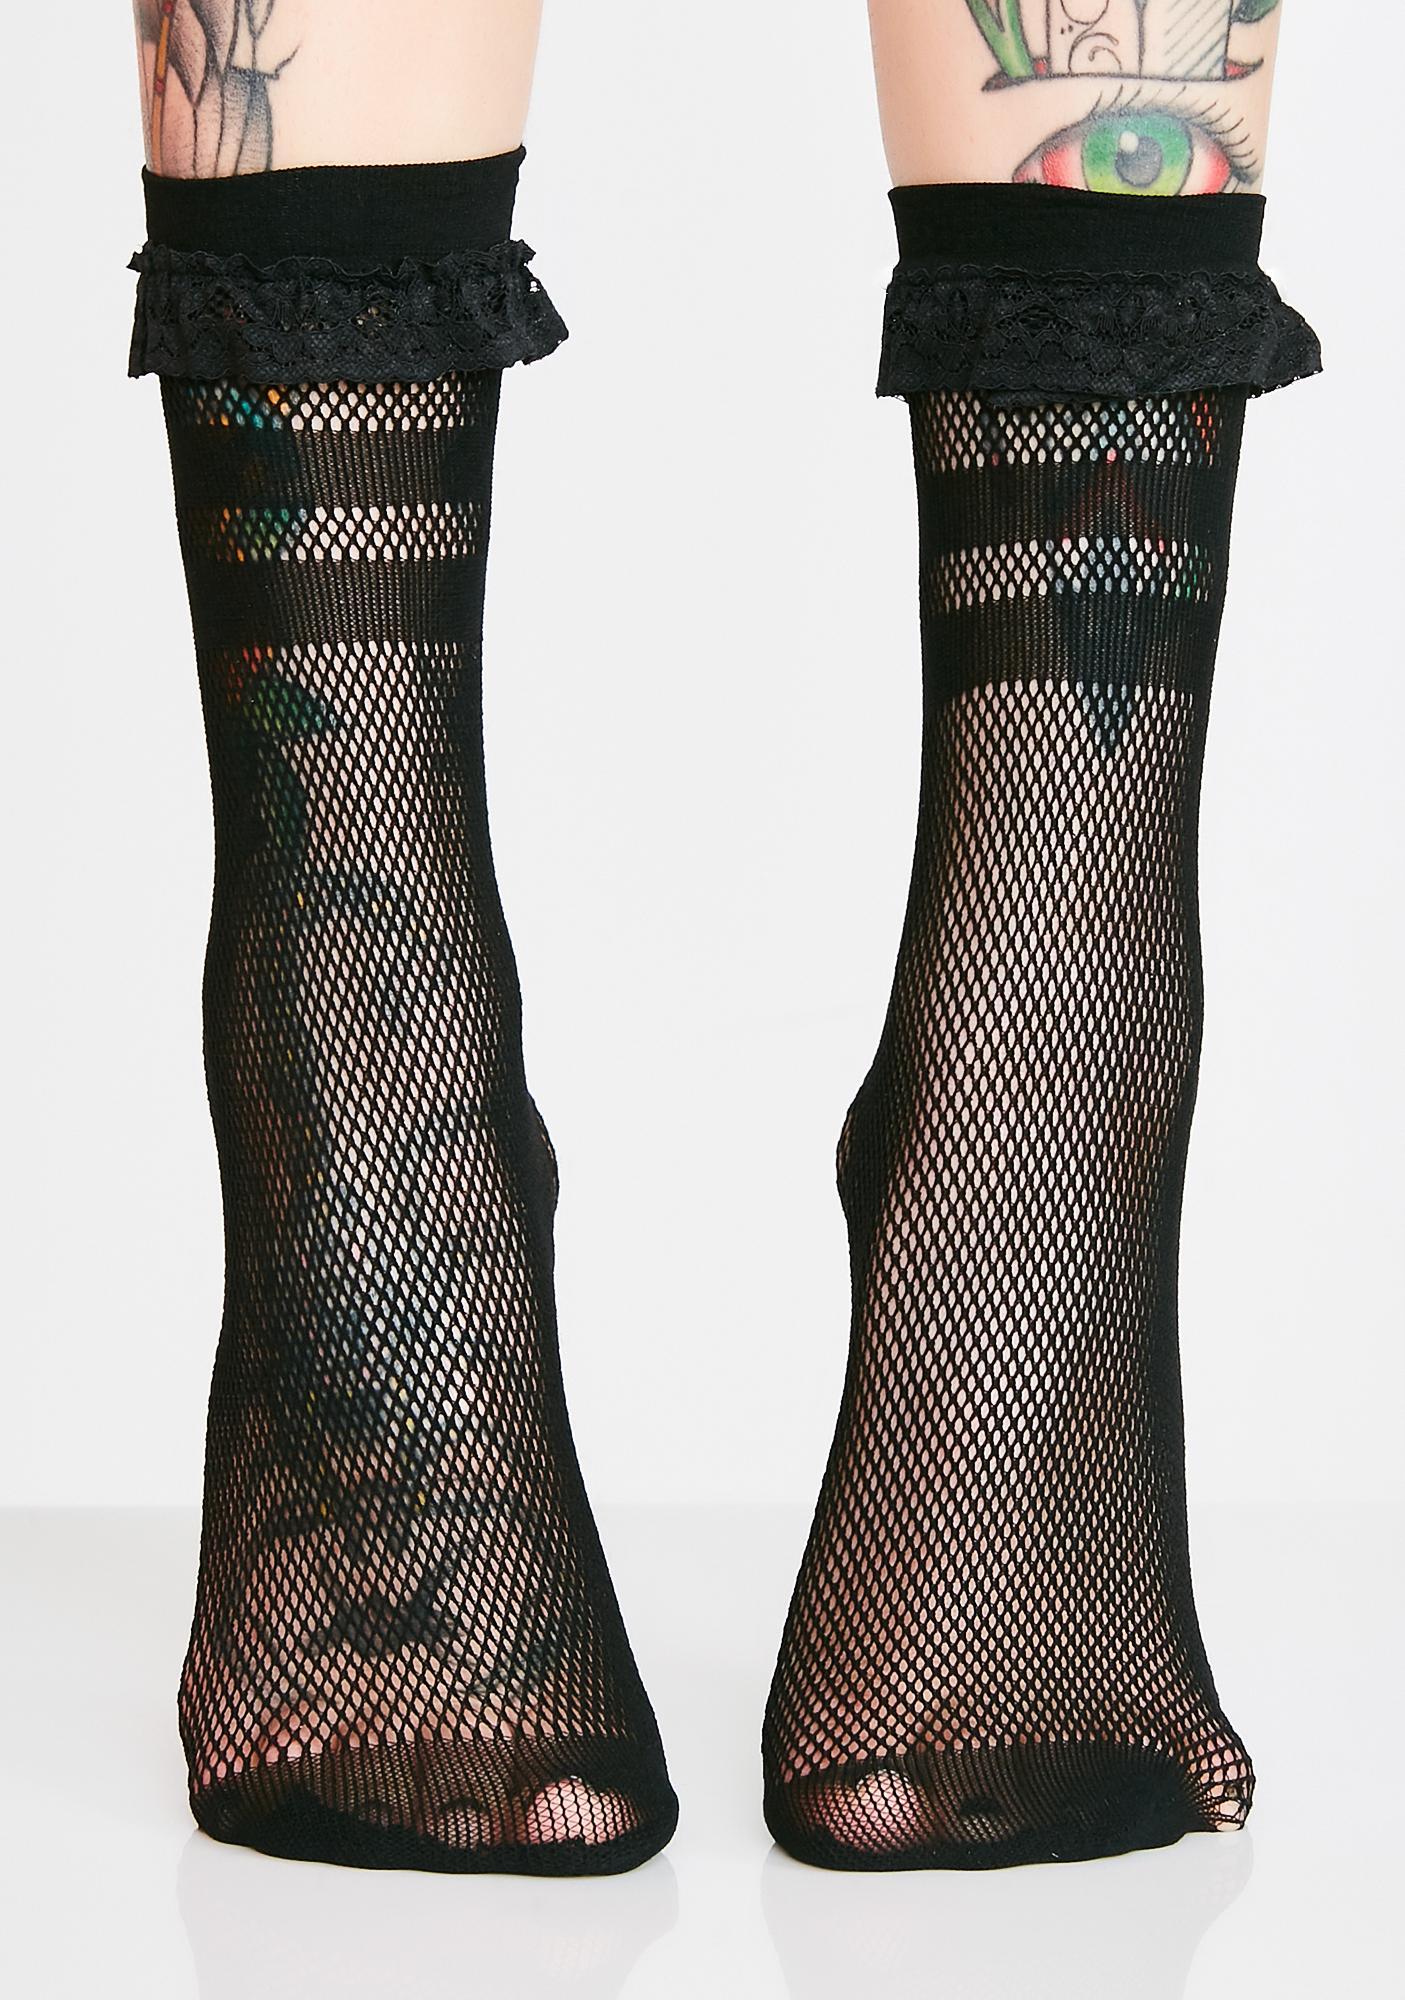 Killstar Bad Ghoul Mesh Socks